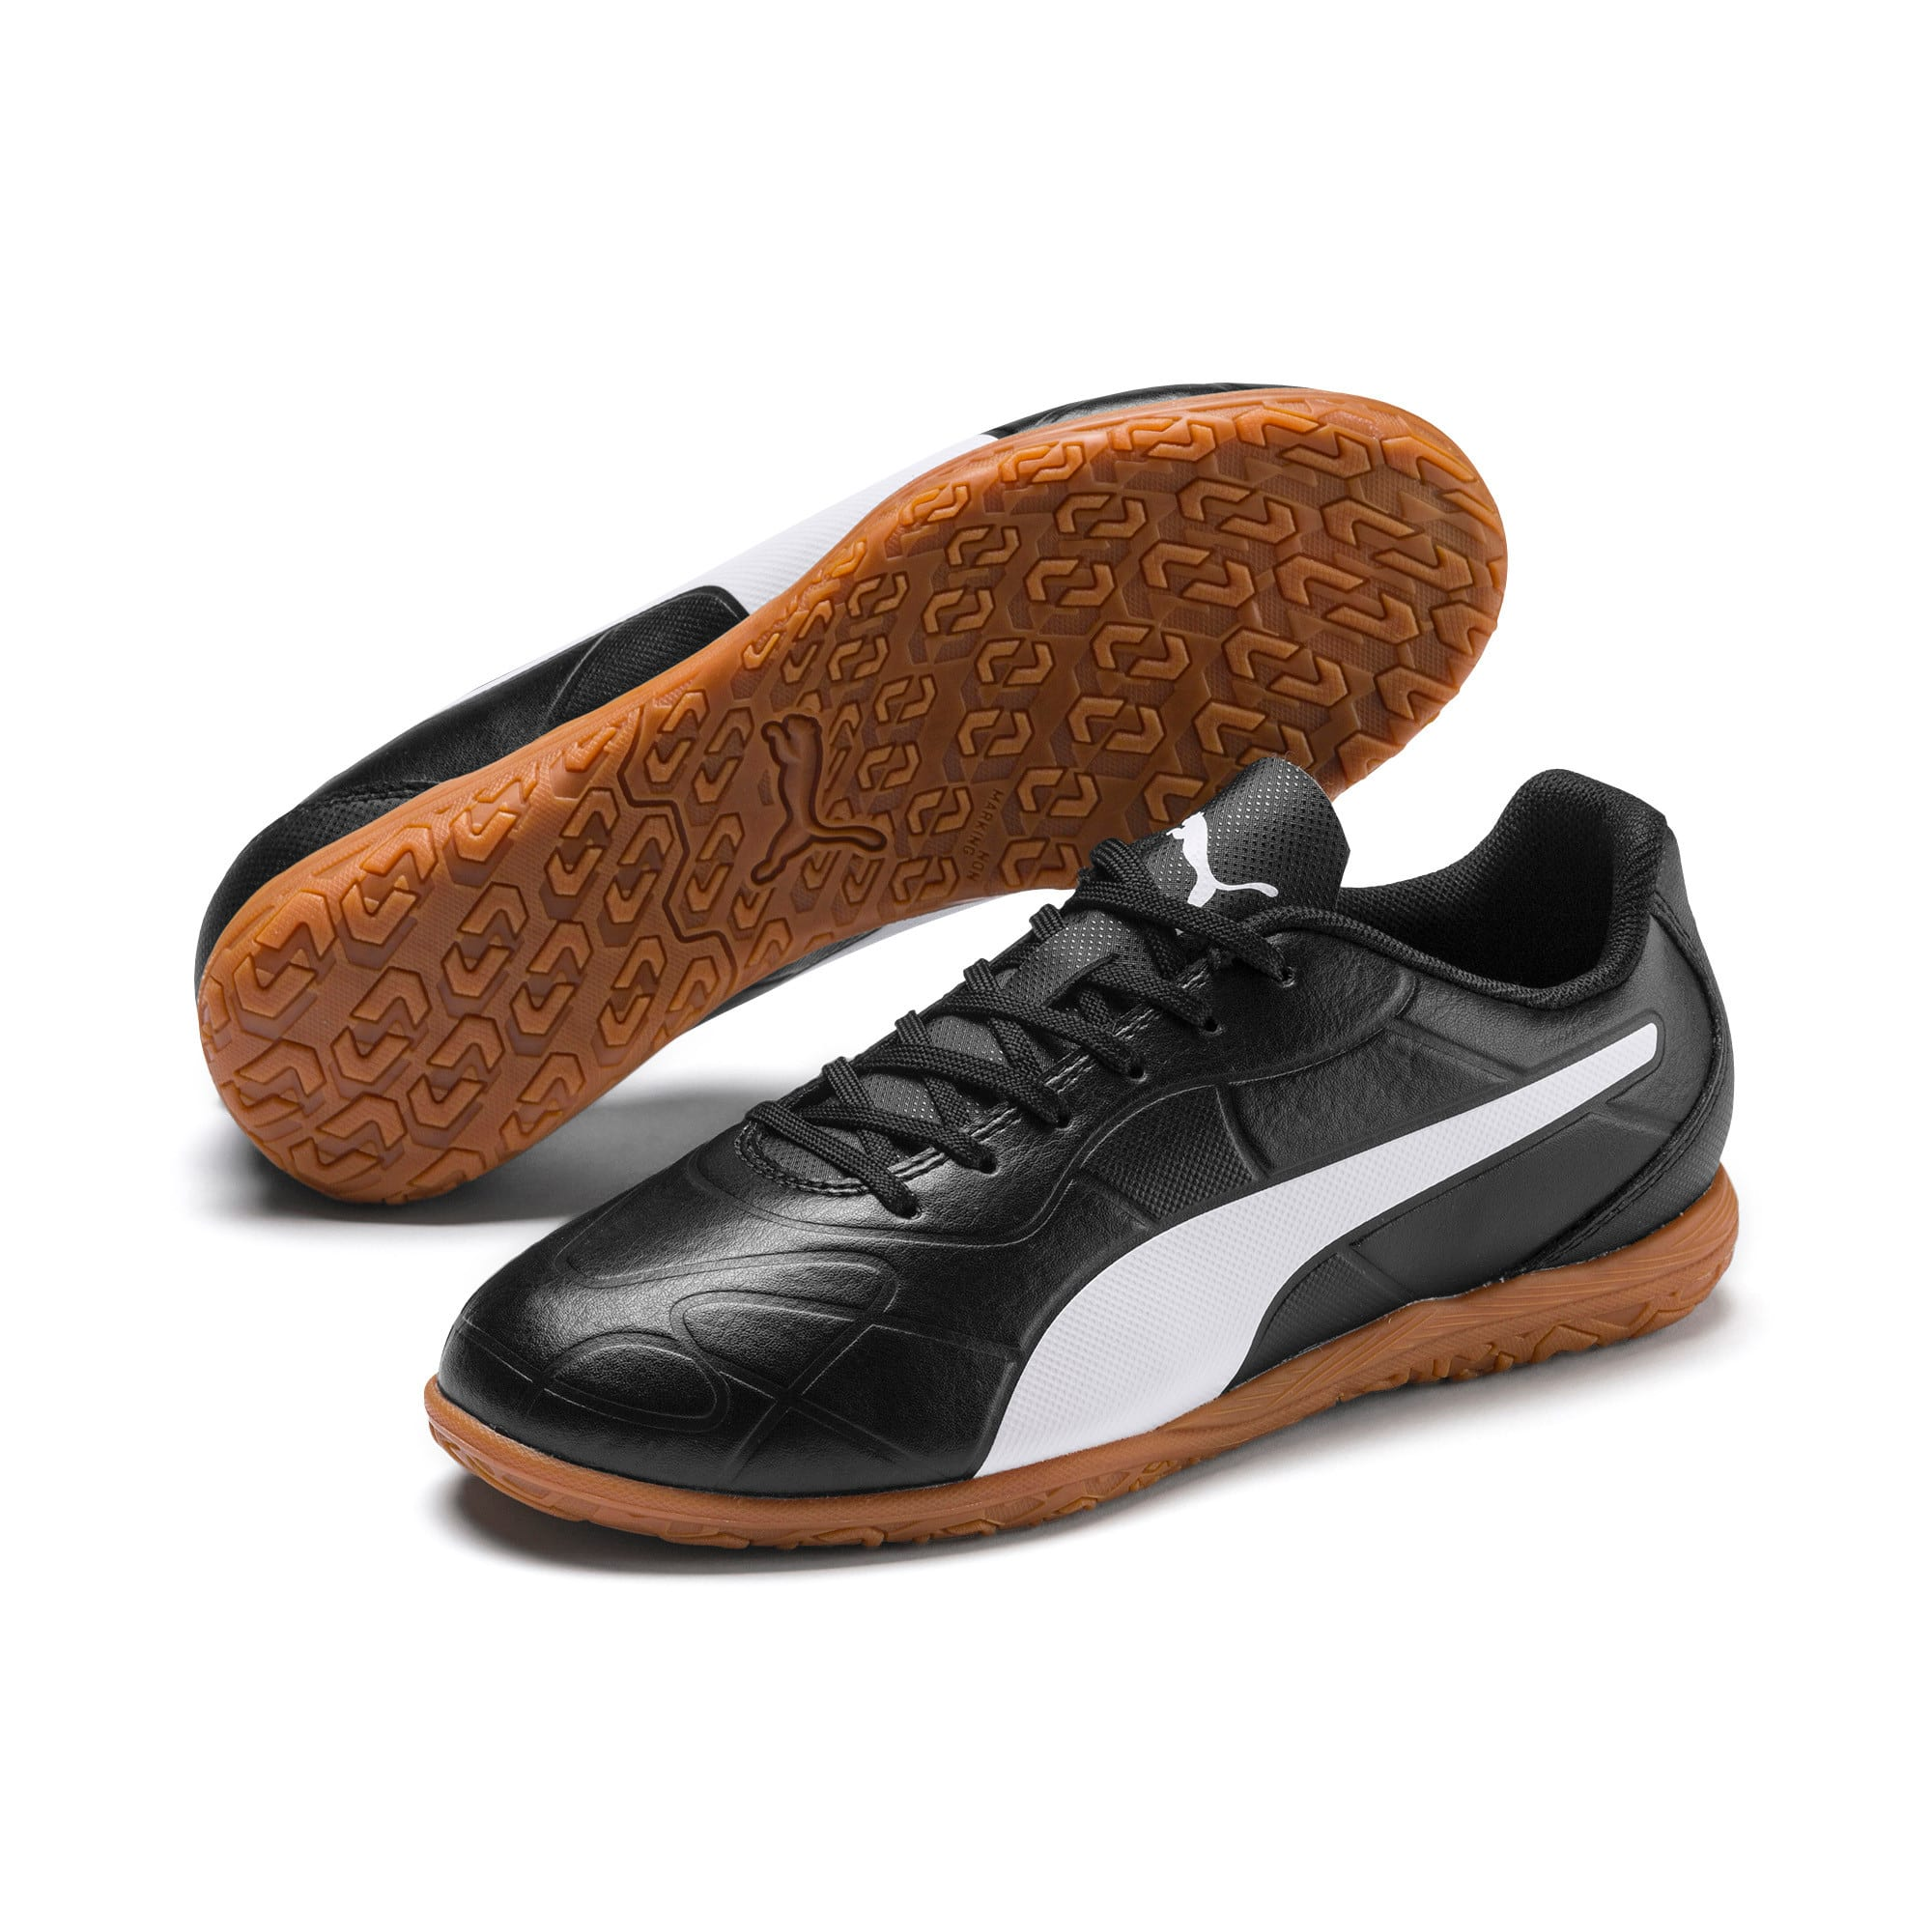 Thumbnail 2 of Monarch IT Youth Fußballschuhe, Puma Black-Puma White, medium